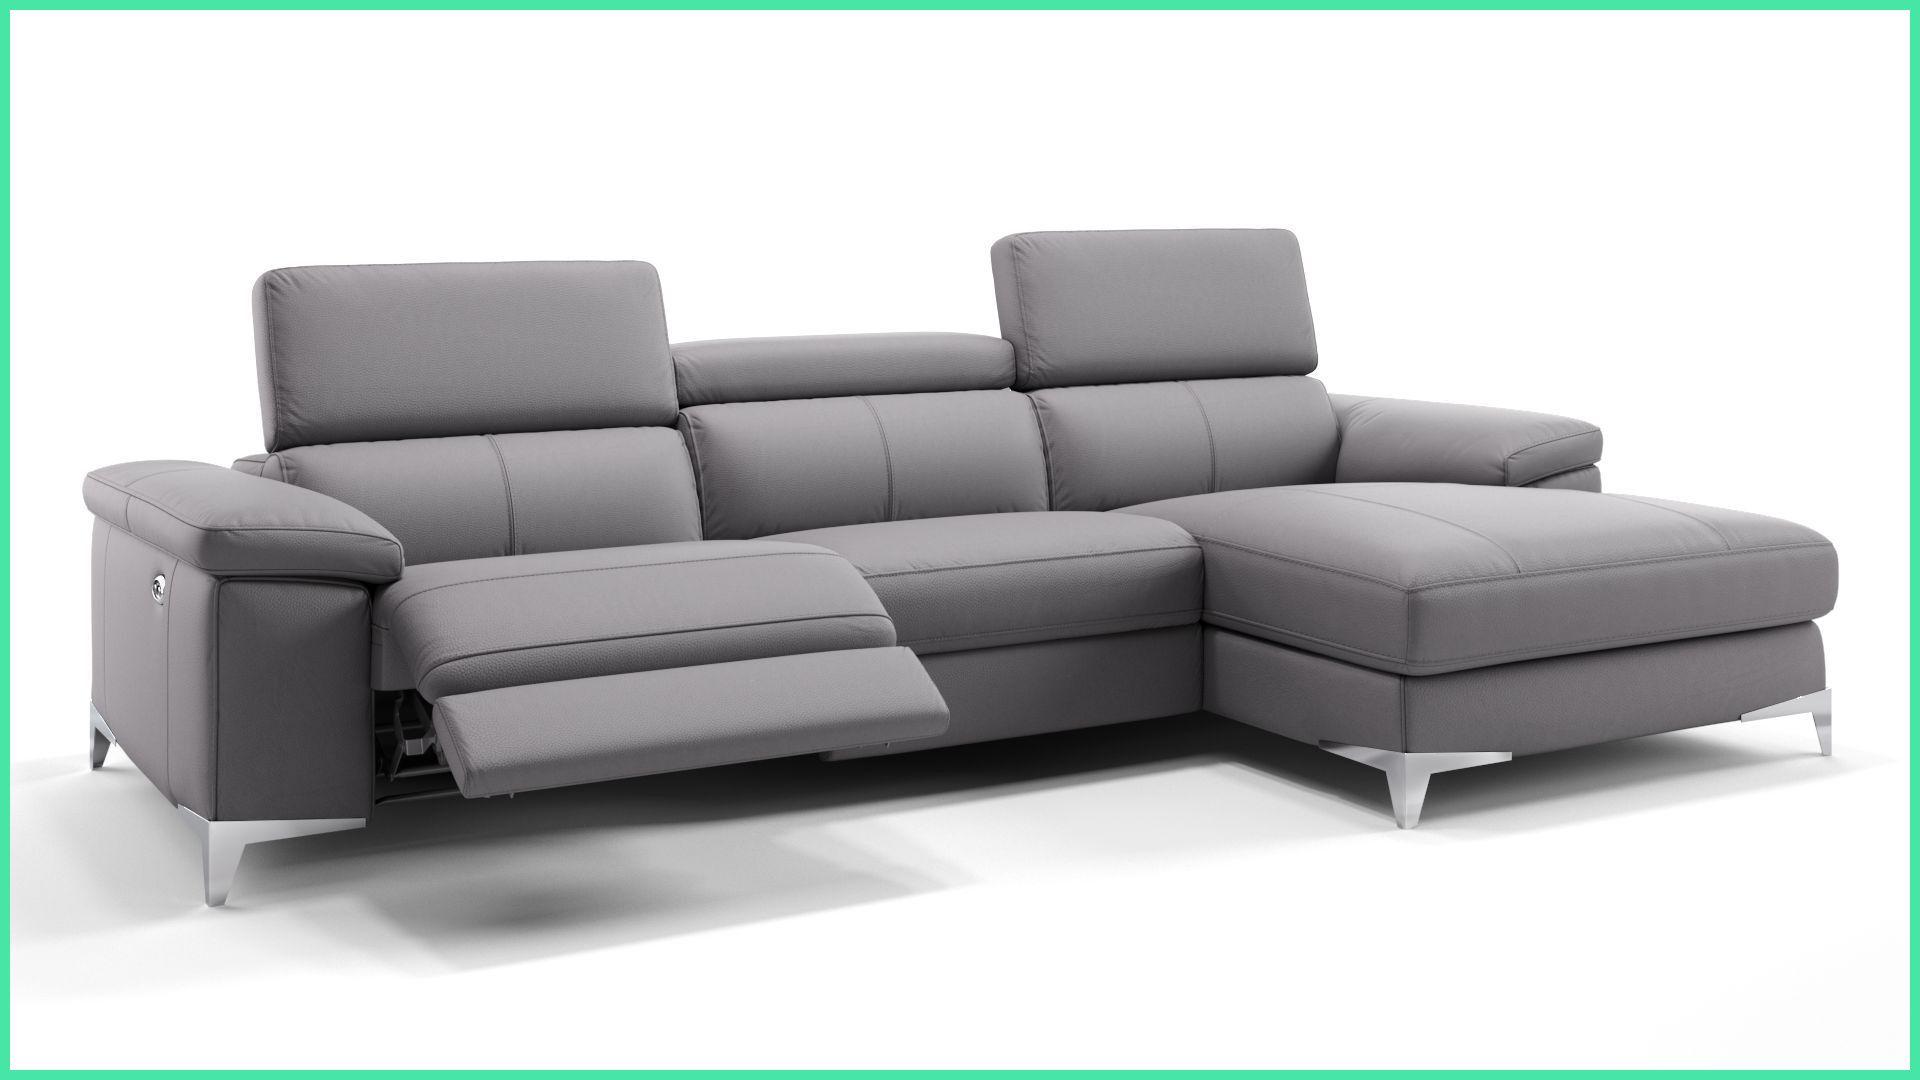 Sofa Dreams Ledersofa Wohnlandschaft Designersofa Couchgarnitur